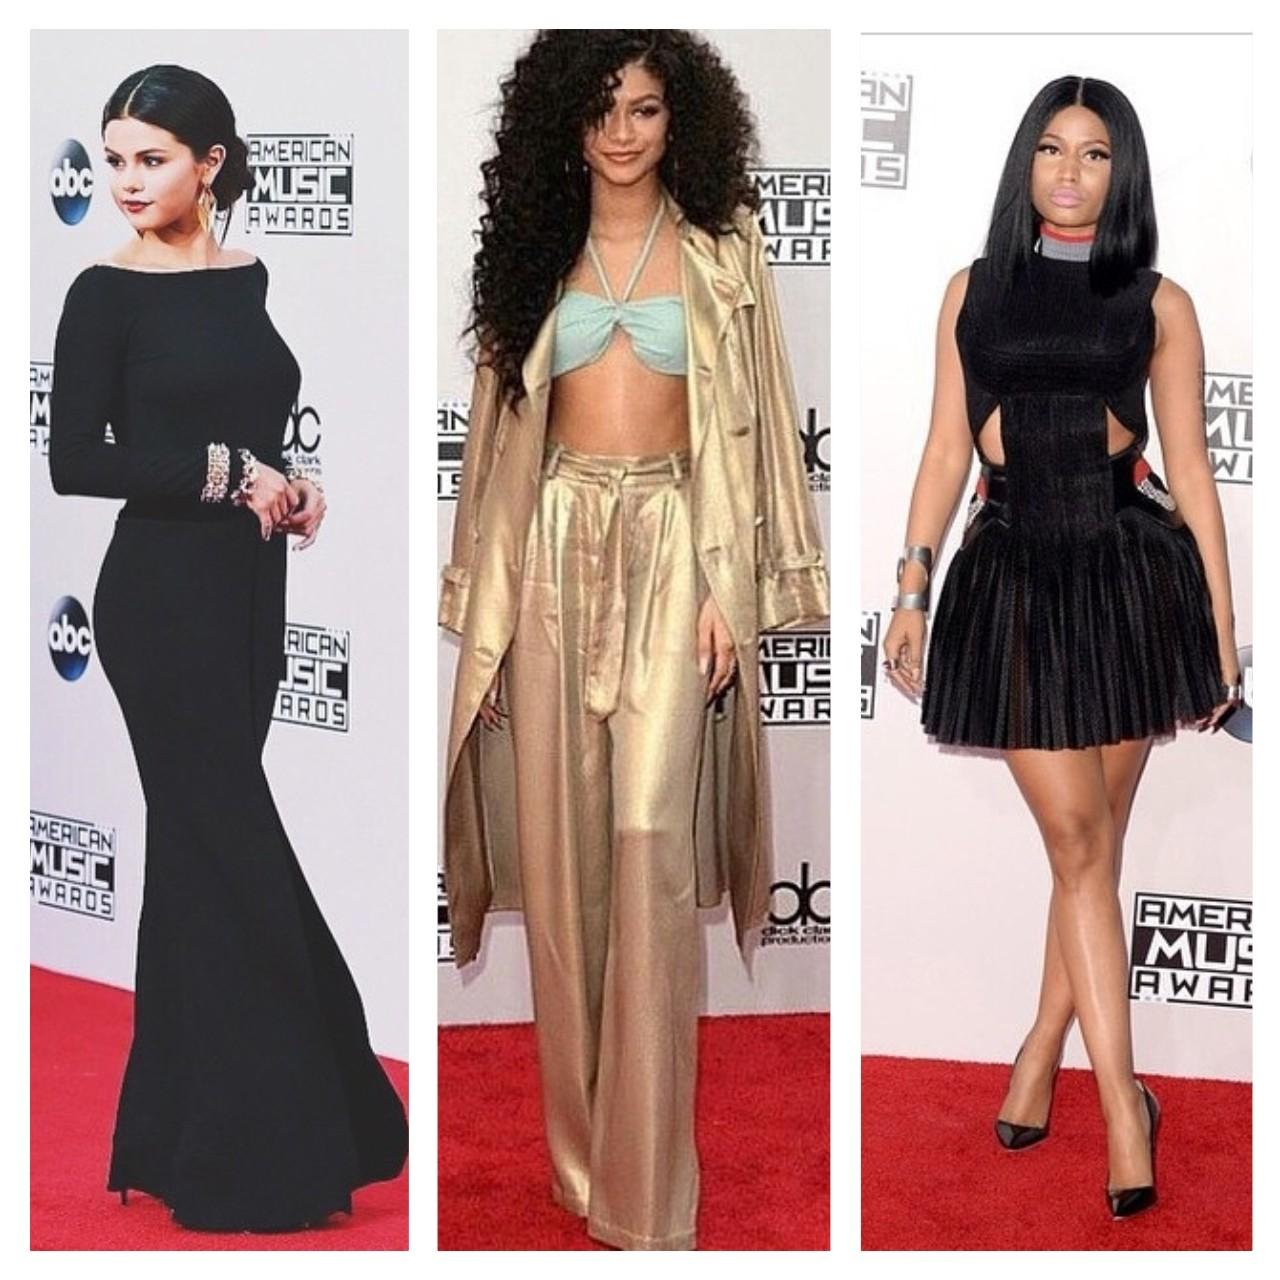 zendaya selena gomez nicki minaj American Music Awards 2014 red carpet